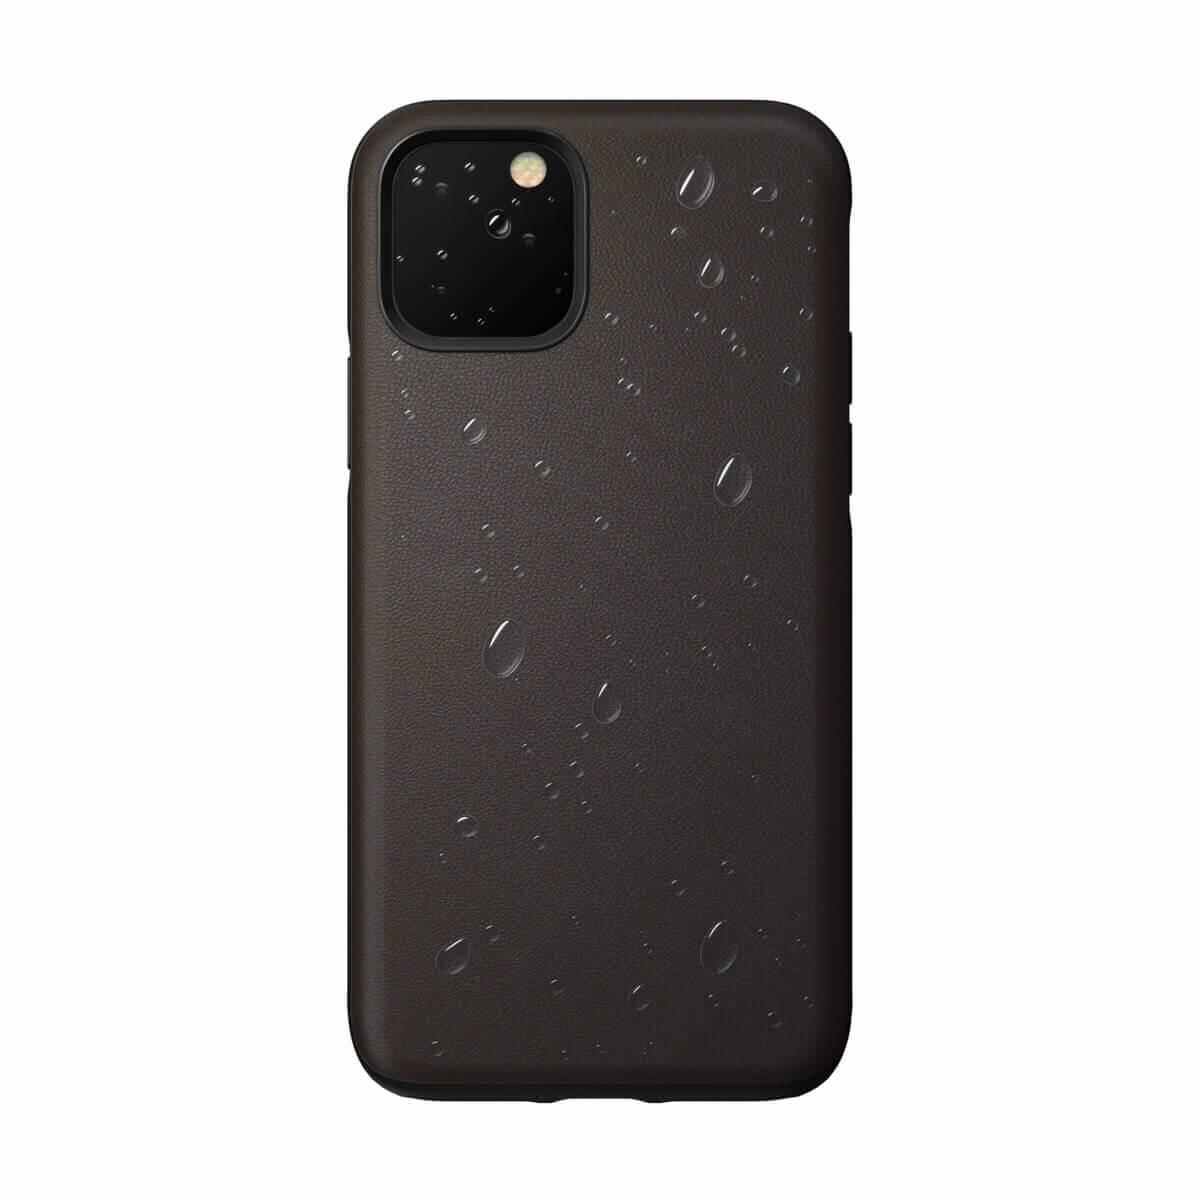 Nomad Leather Rugged Waterproof Case — кожен (естествена кожа) кейс за iPhone 11 Pro Max (кафяв) - 5